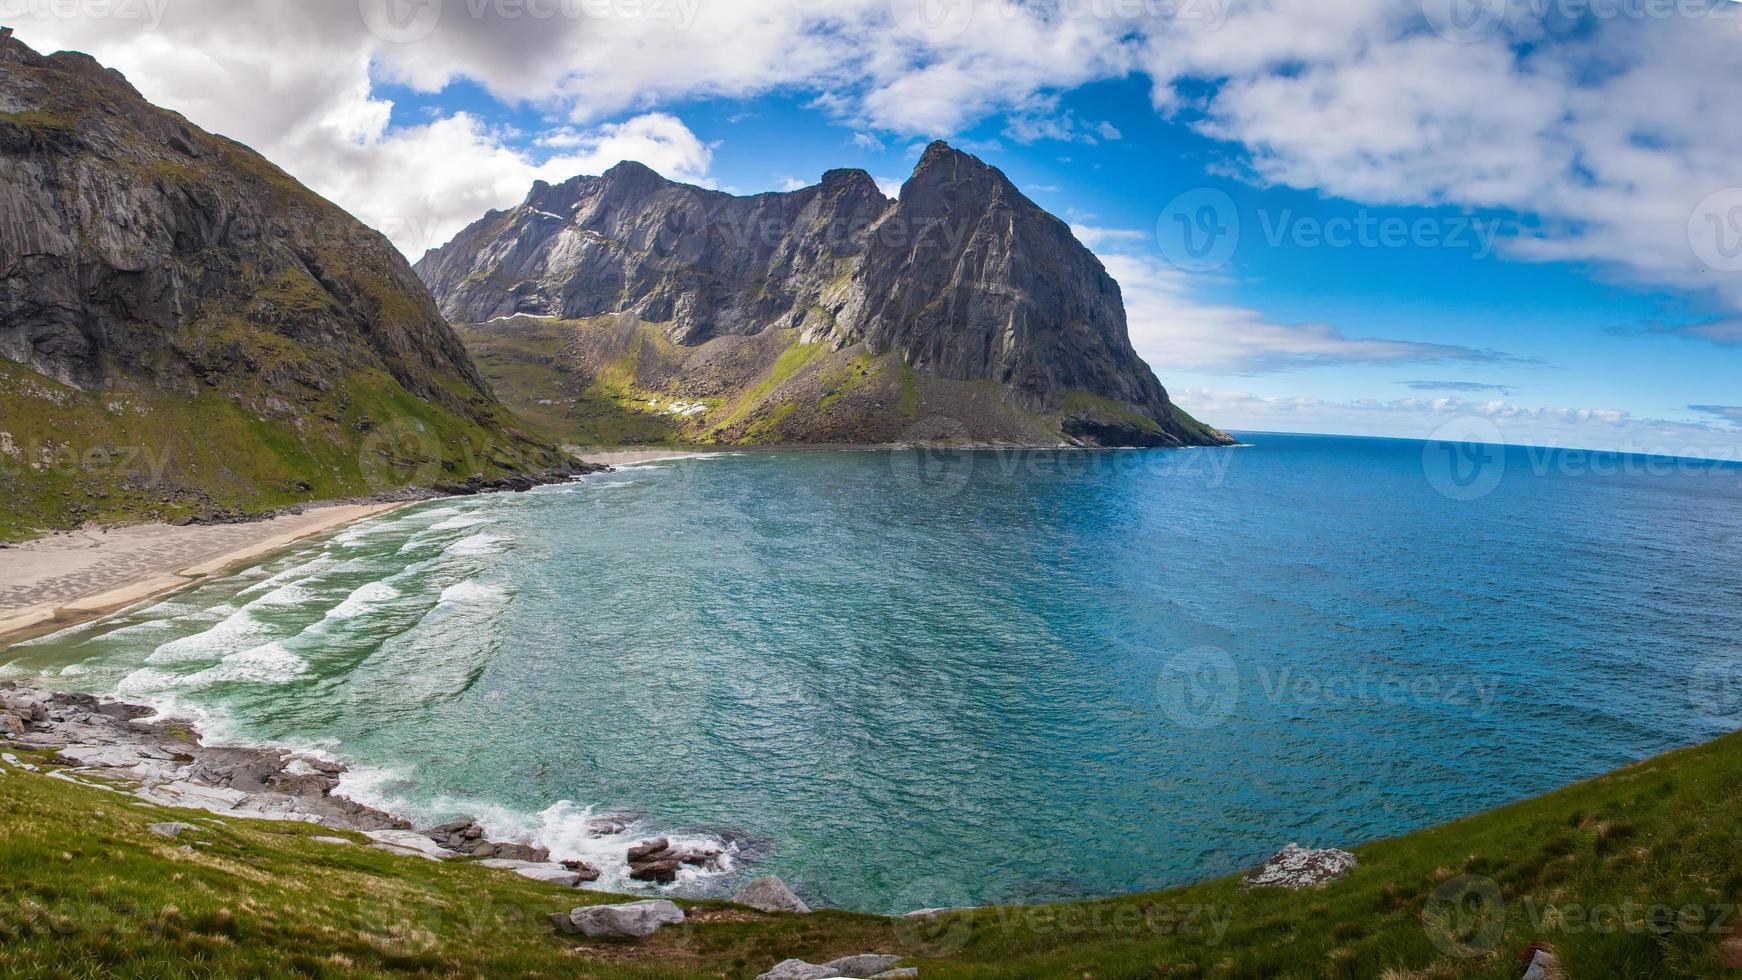 Playa paraíso kvalvika en las islas lofoten en noruega foto